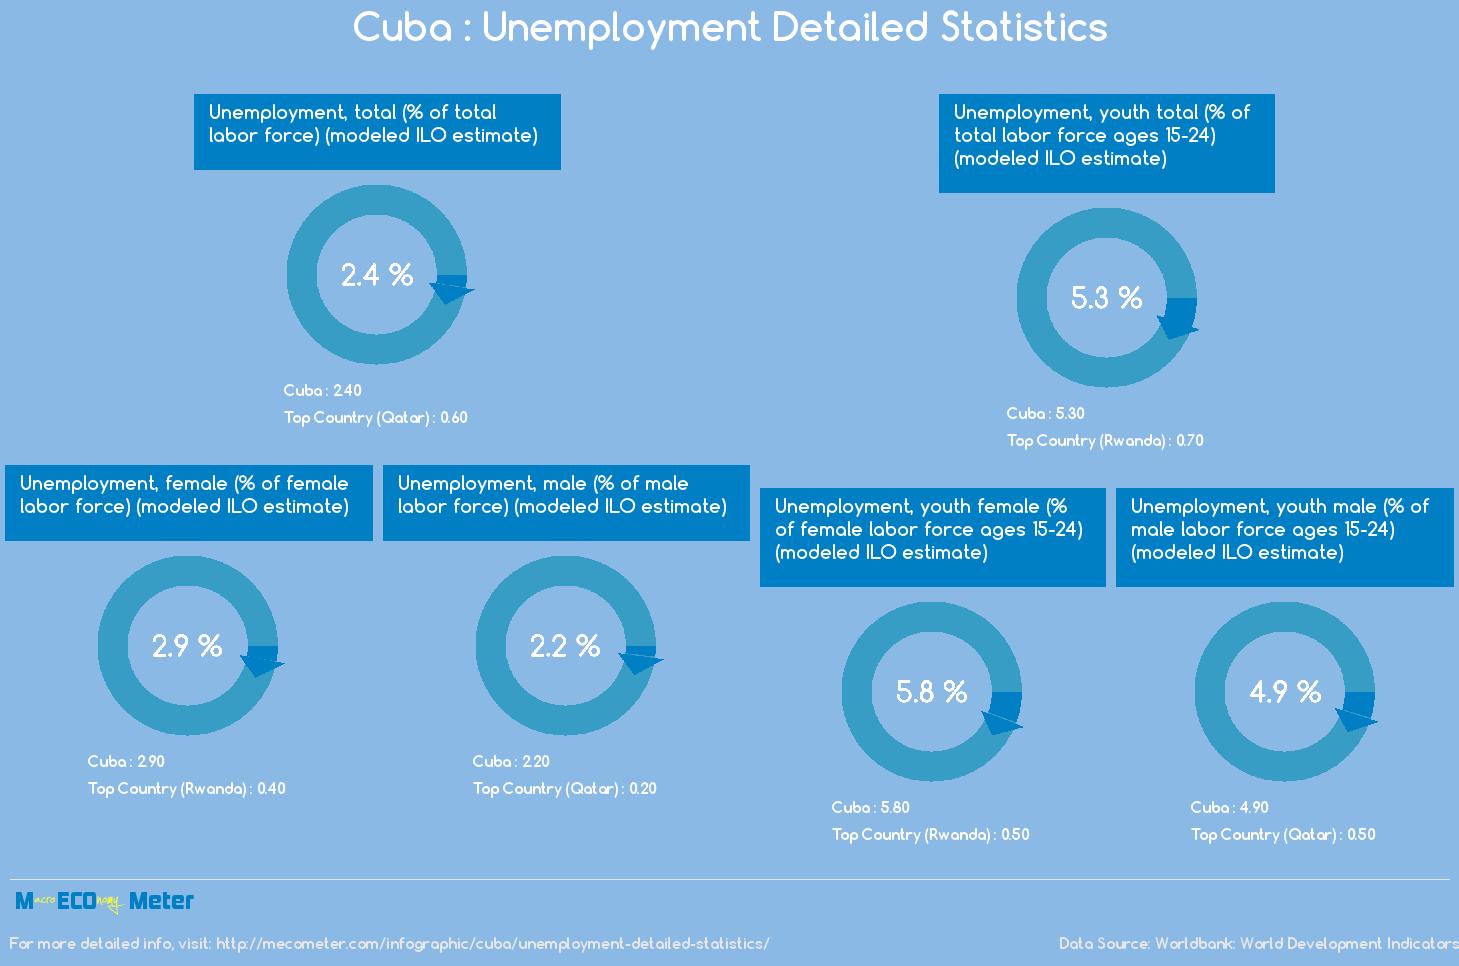 Cuba : Unemployment Detailed Statistics